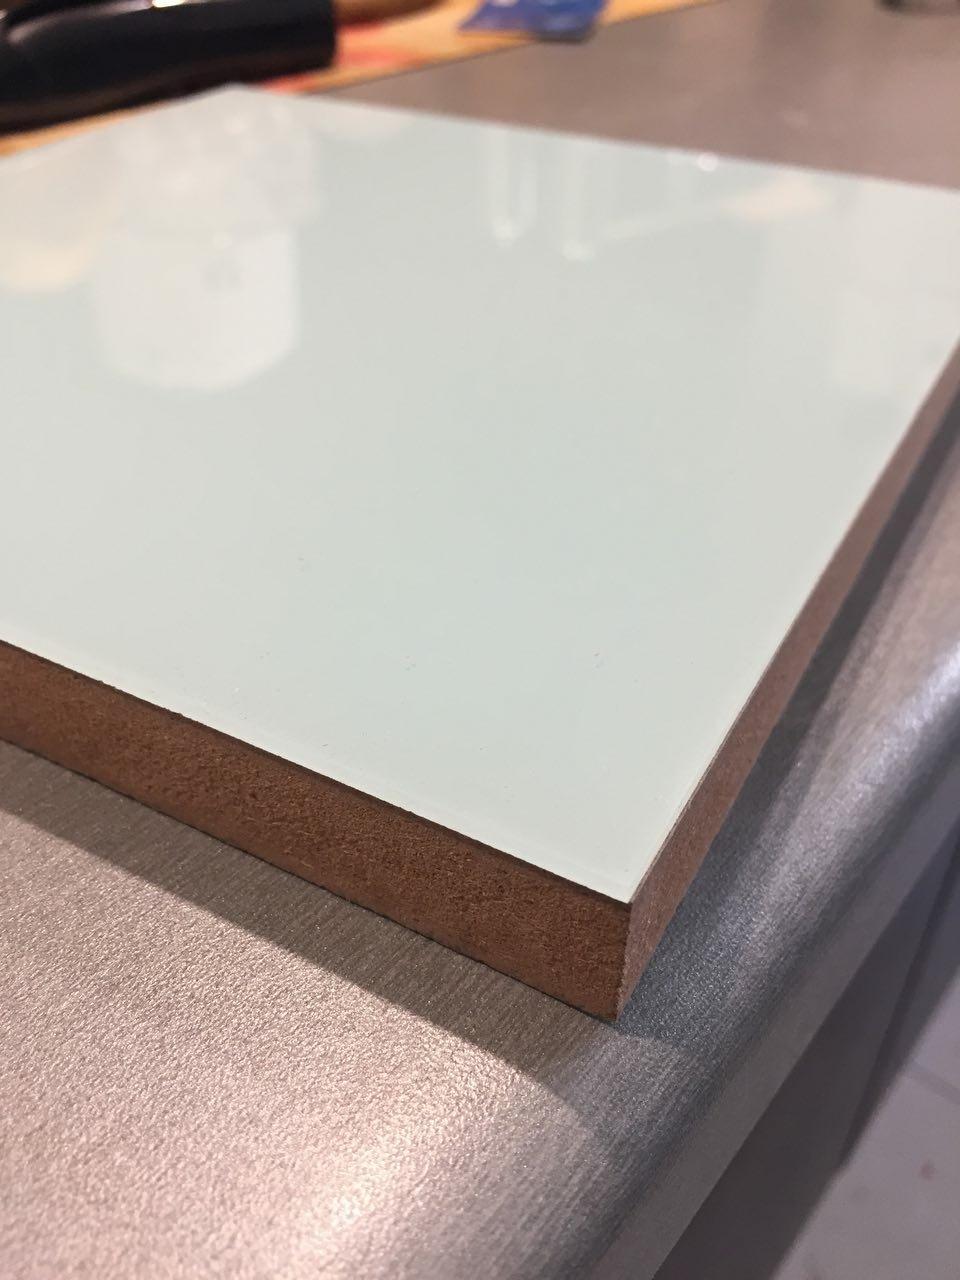 رنگ ورق کابینت آشپزخانه